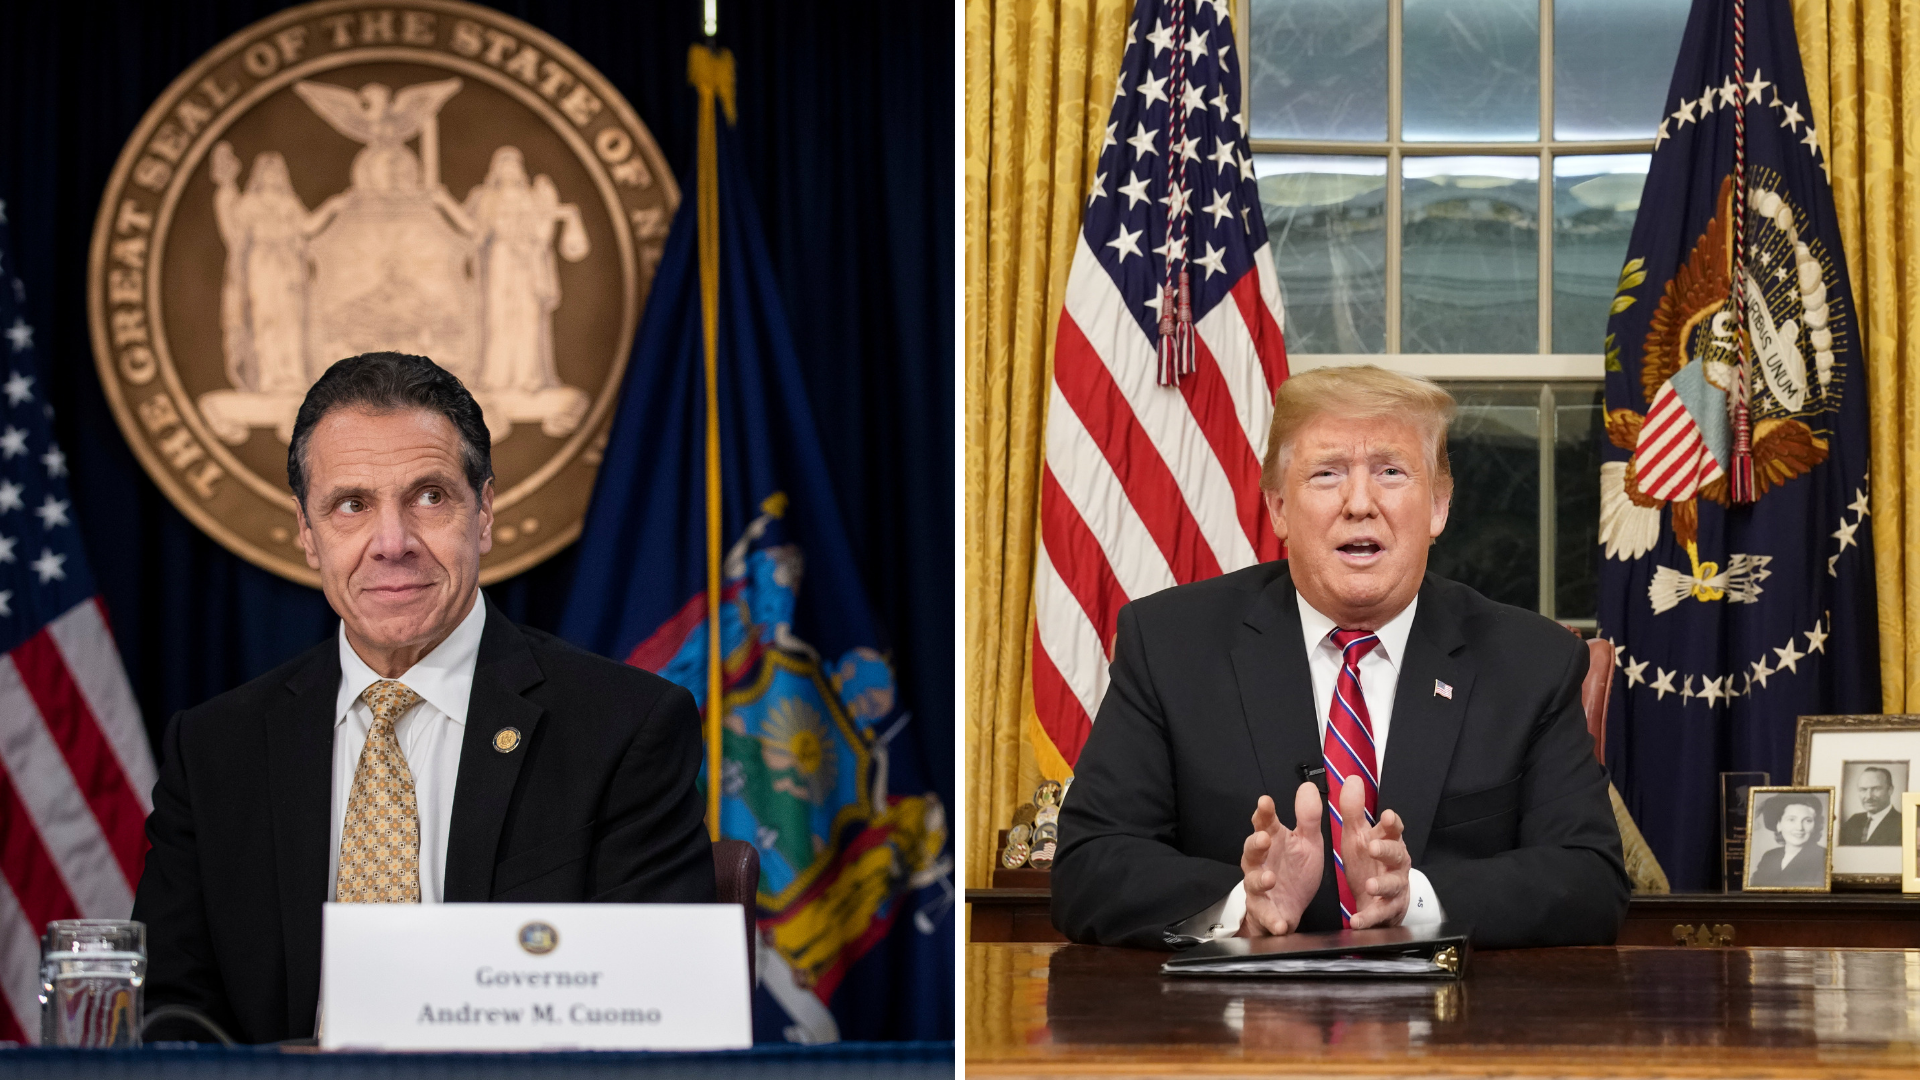 Trump and Cuomo spar over New York's bail reformlaw